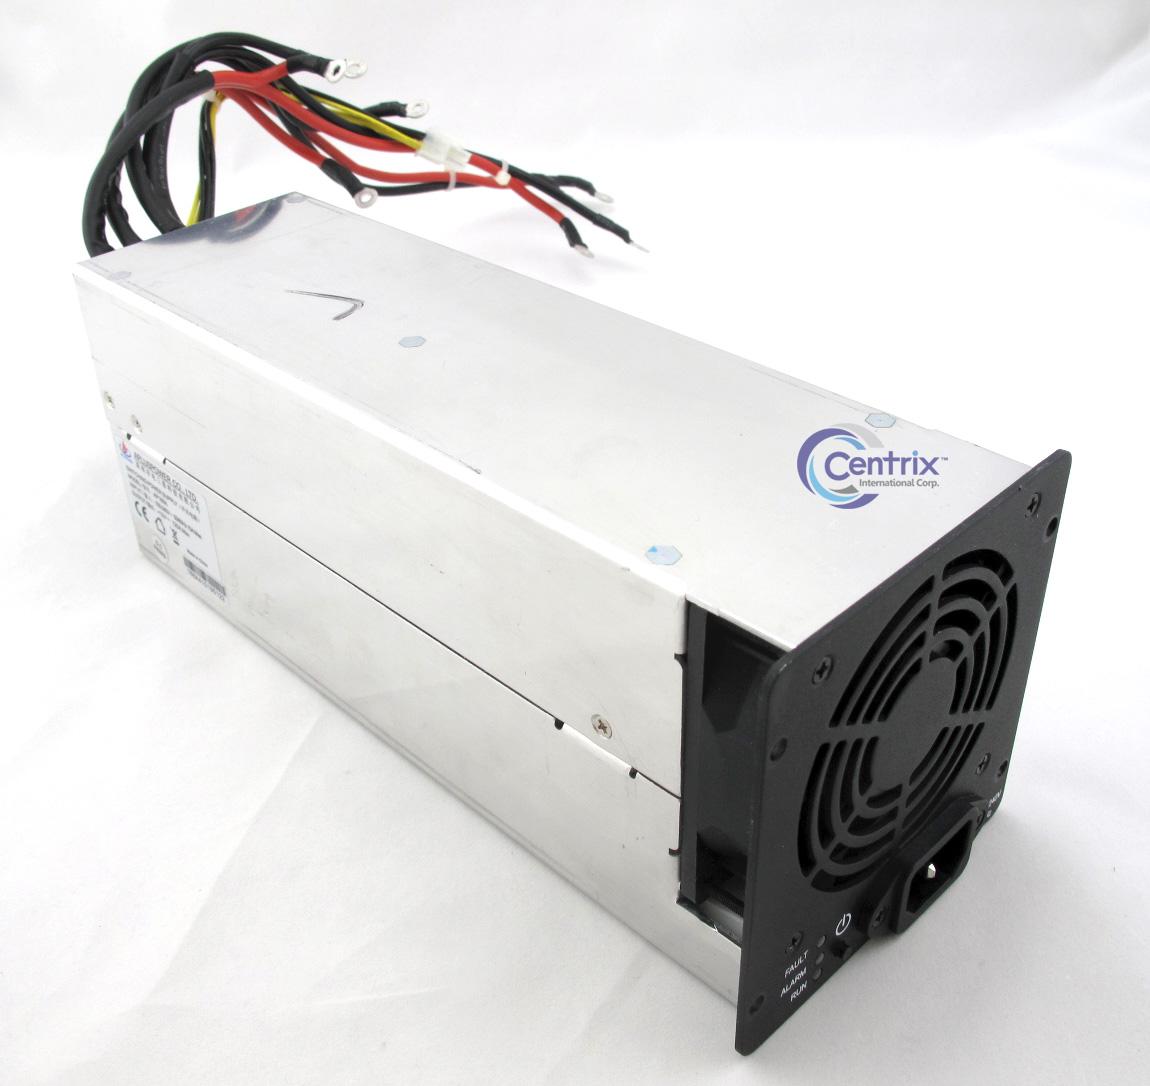 Customized Antminer S4 PSU